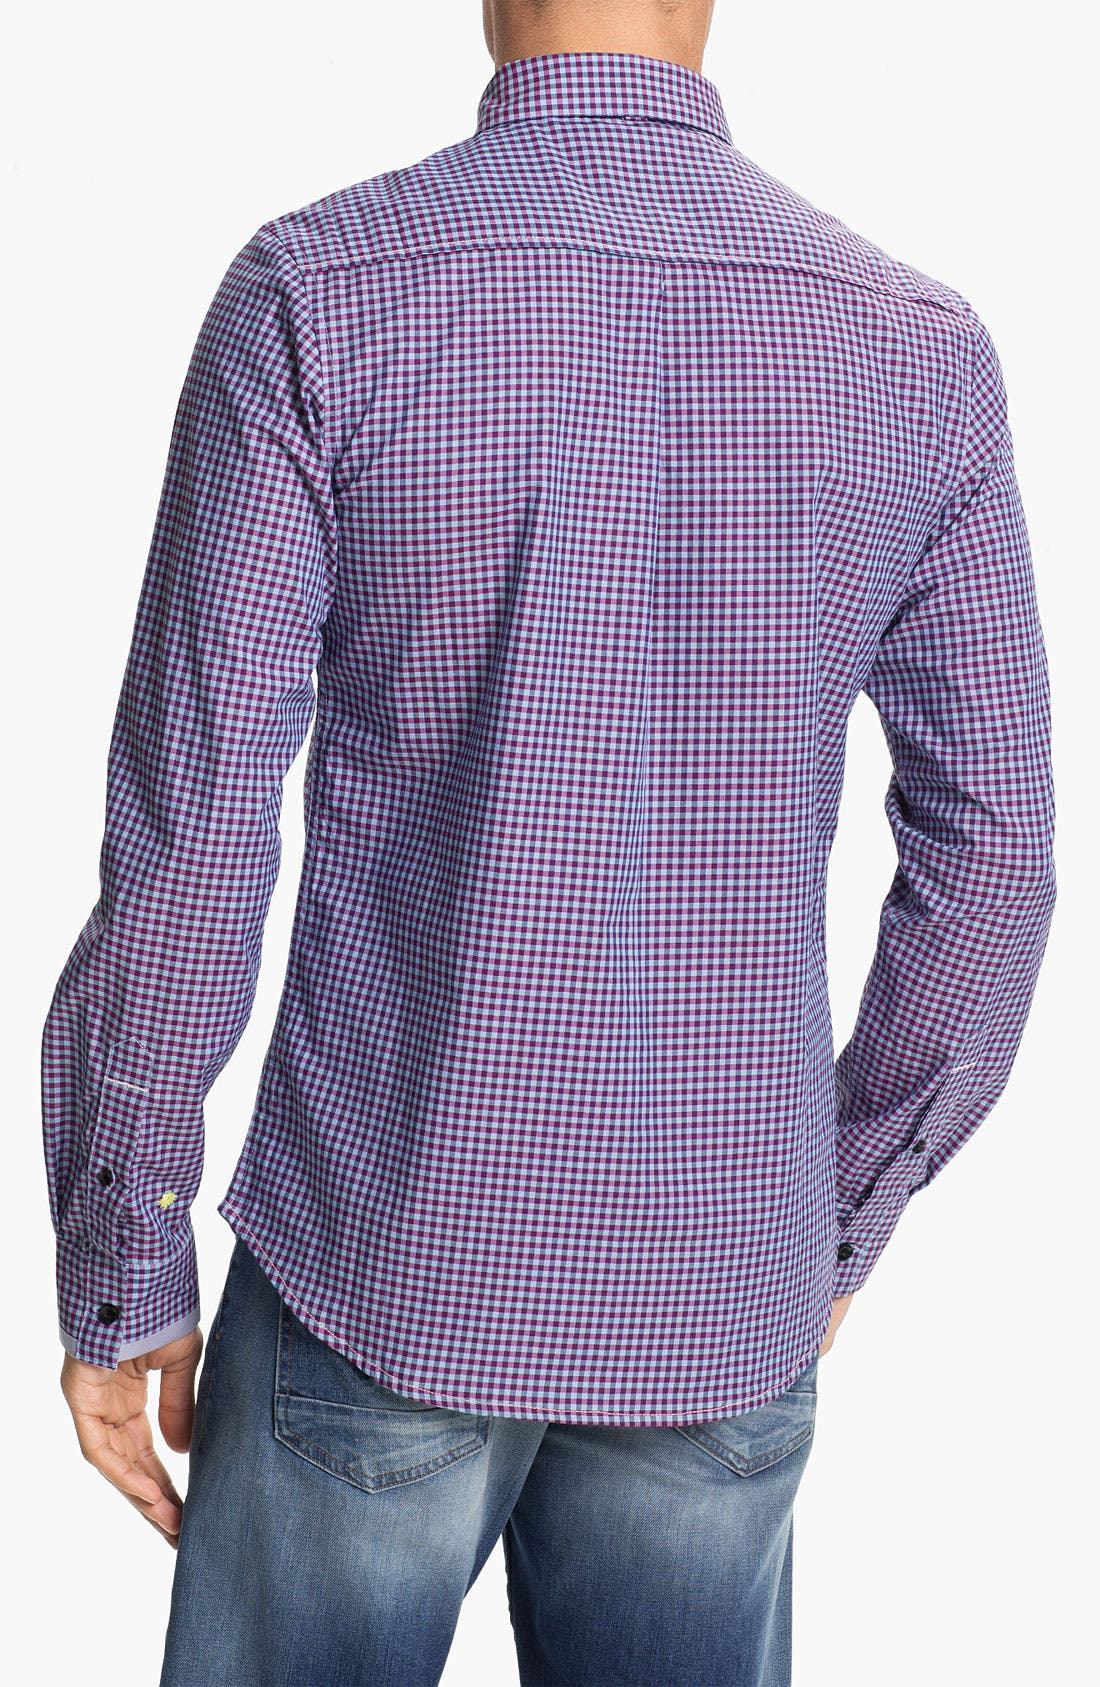 Alternate Image 2  - Descendant of Thieves Gingham Shirt